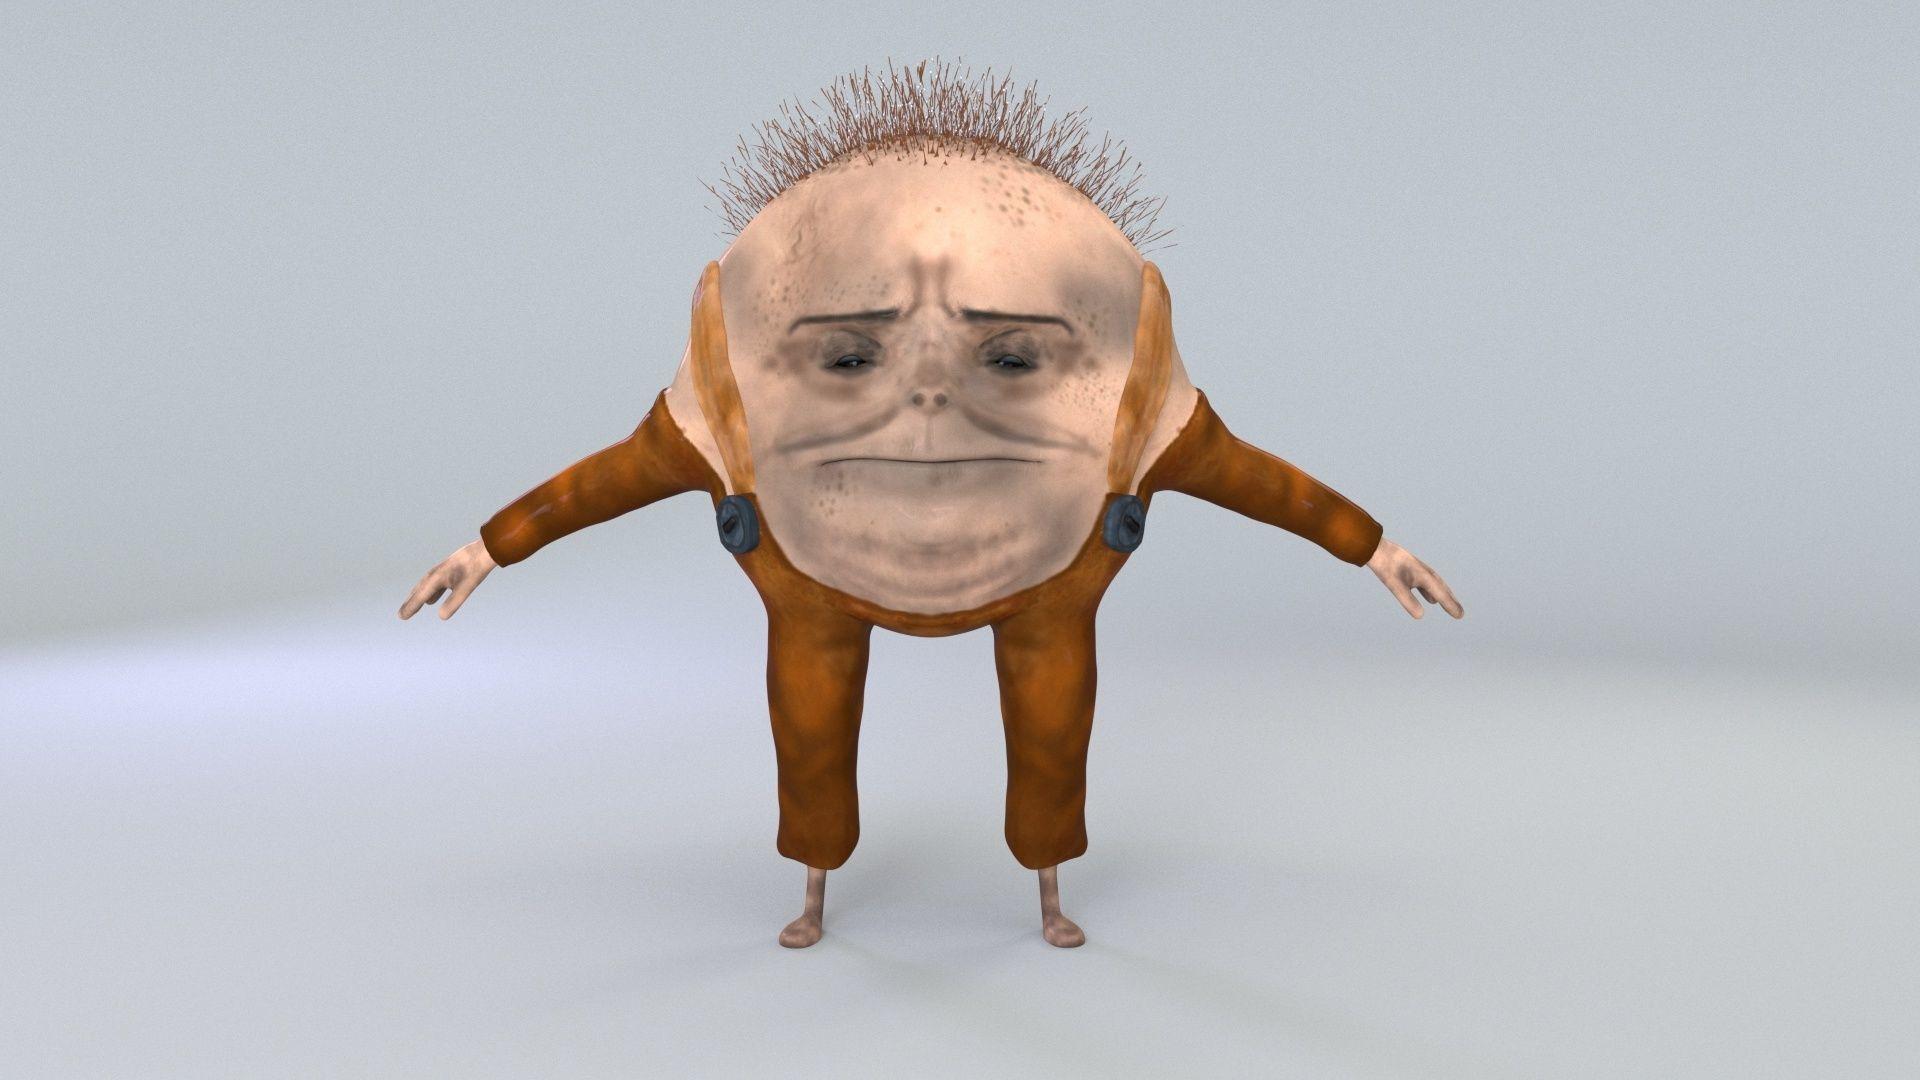 cartoon character humpty dumpty dirty